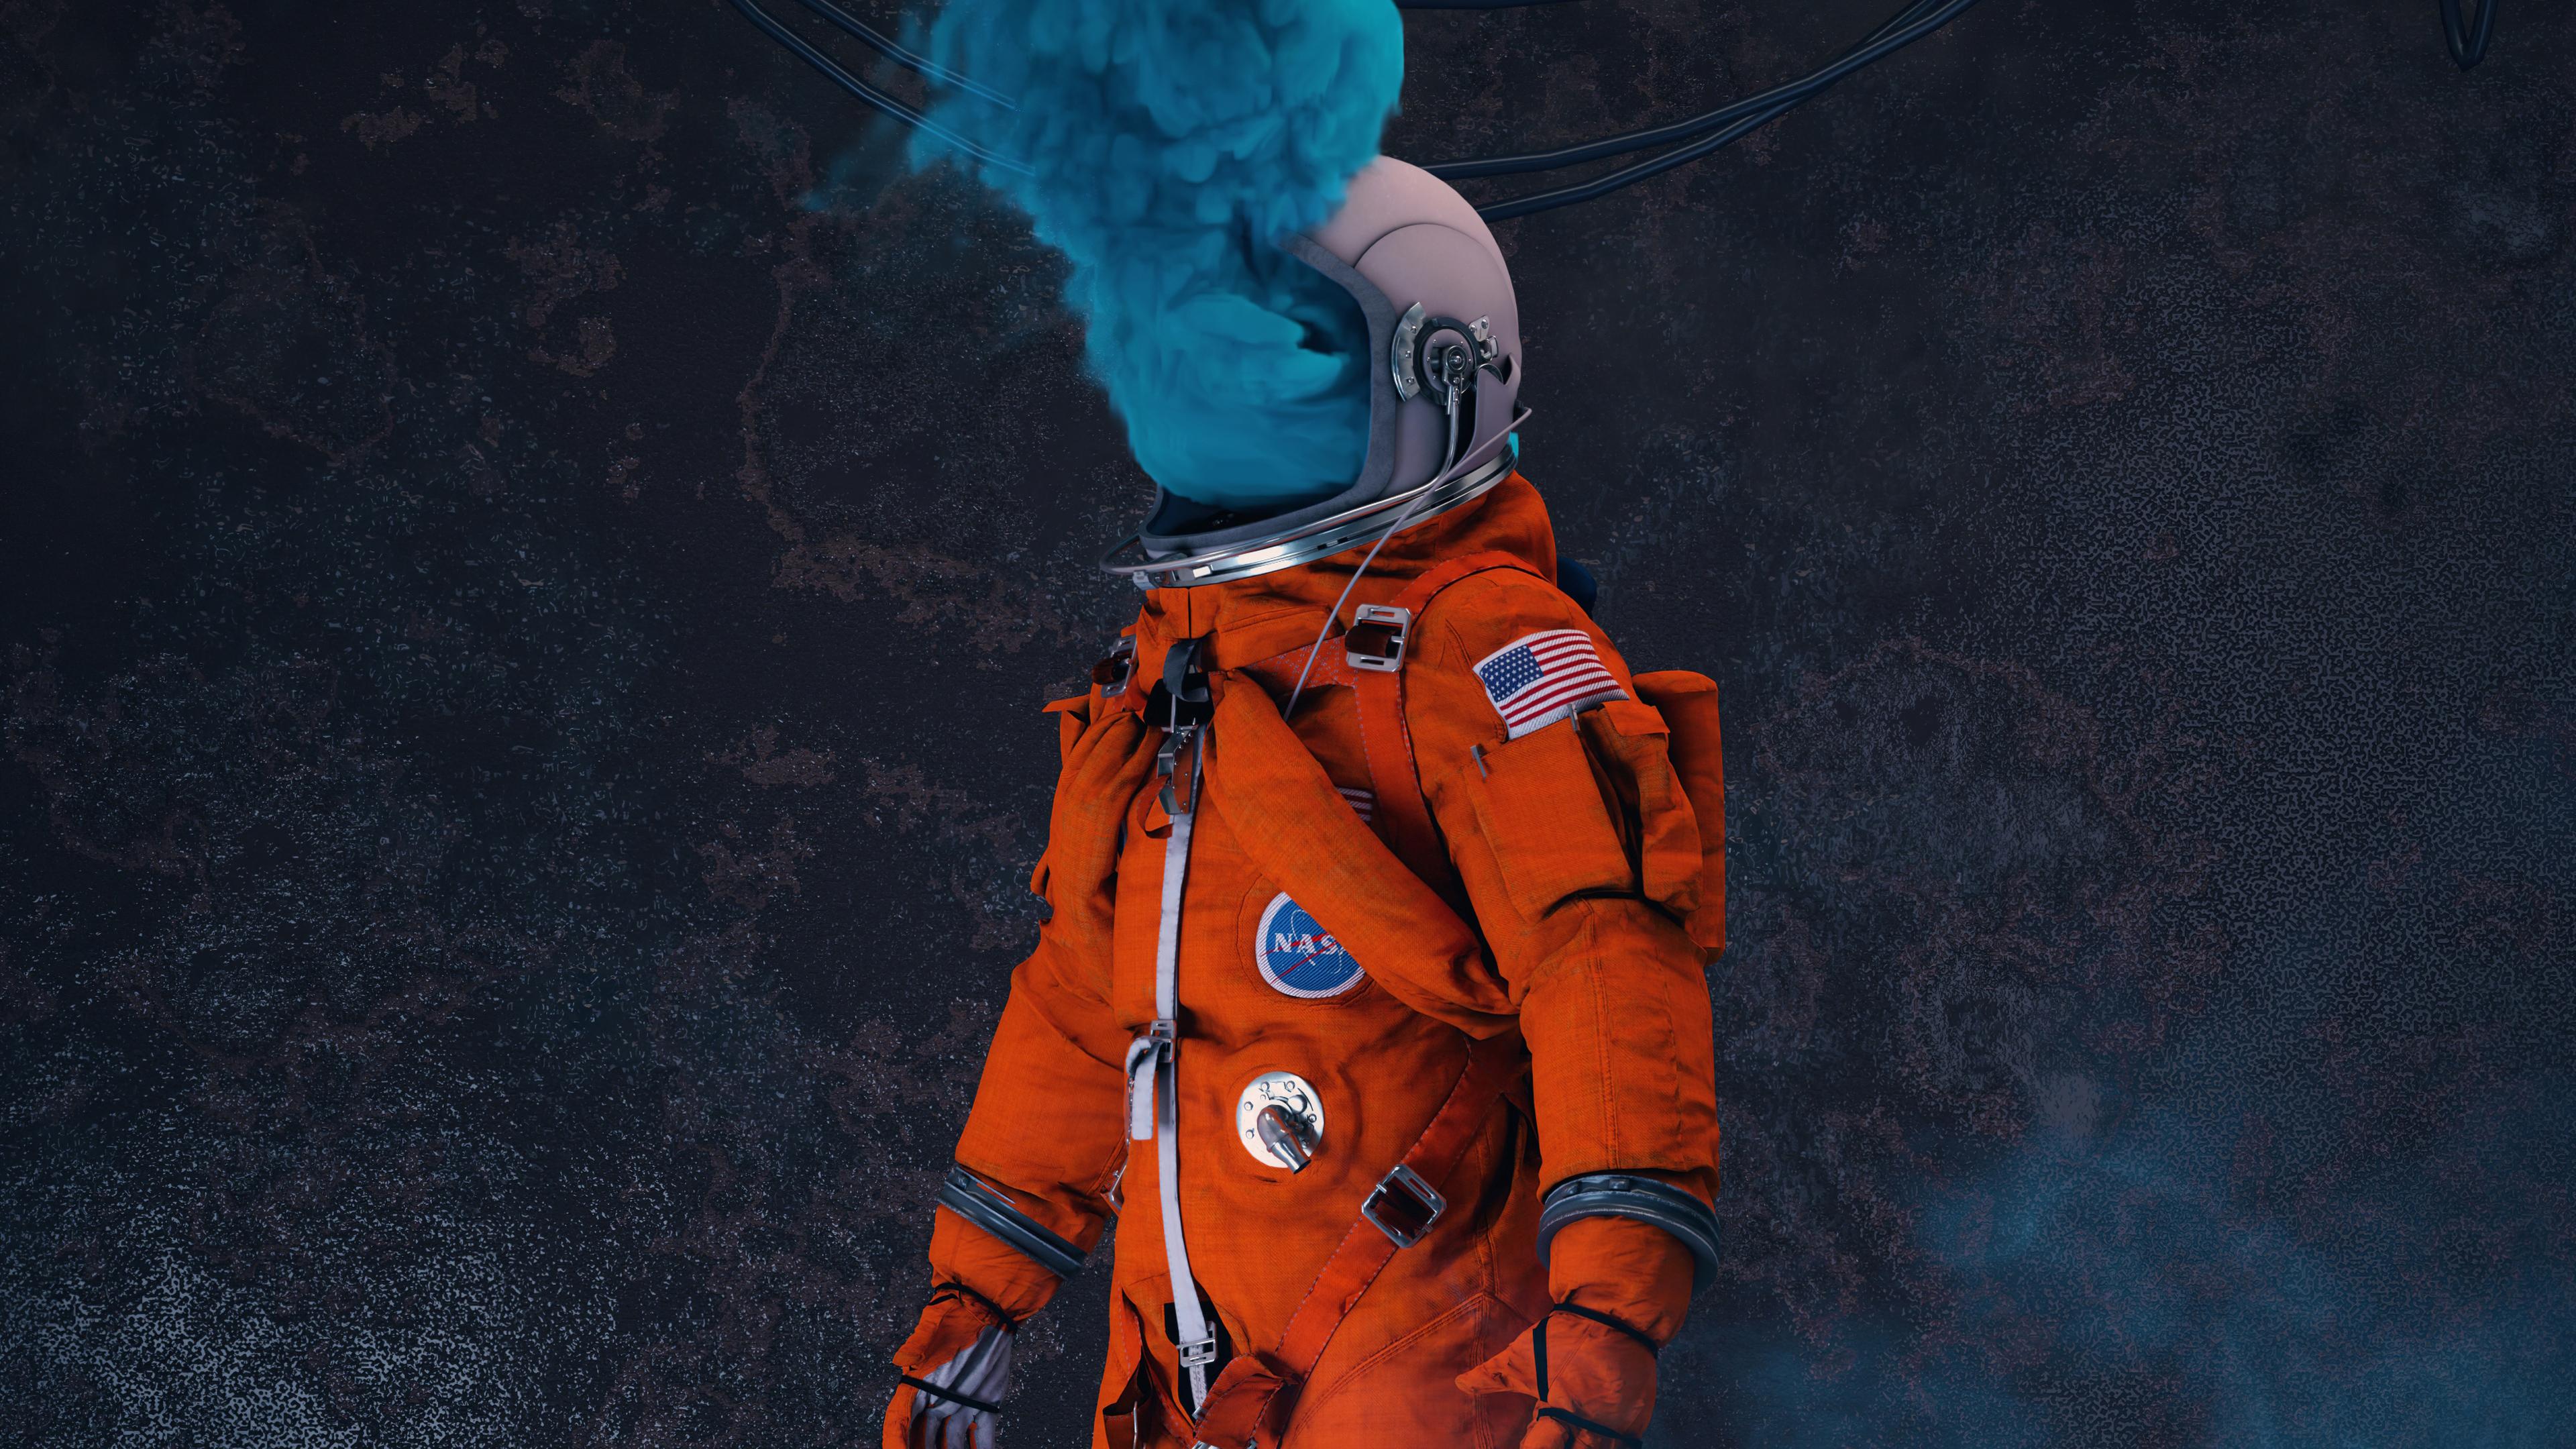 Wallpaper 4k Astronaut Nasa Take Me Away